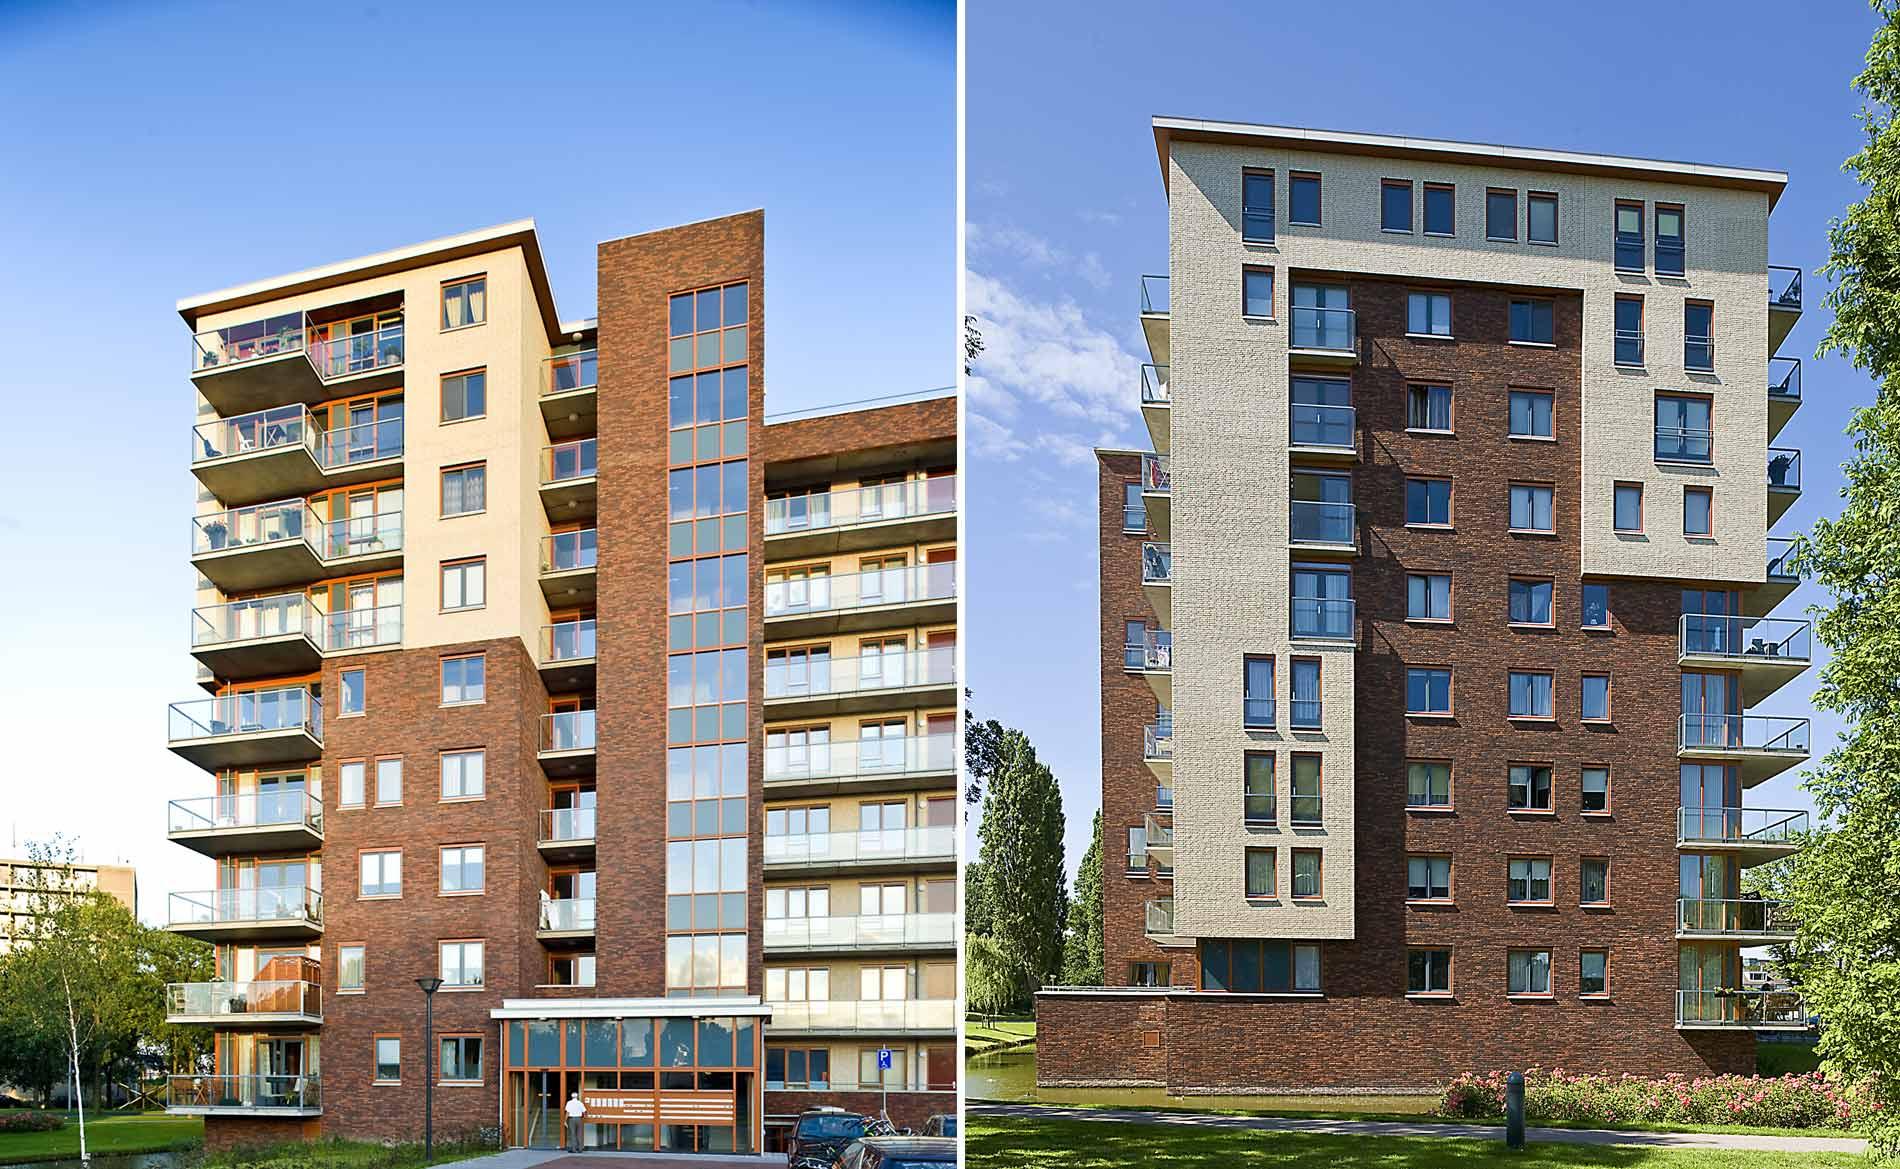 stadsvernieuwing herstructurering Heemskerk Waterrijck appartementen woningen park BBHD architecten